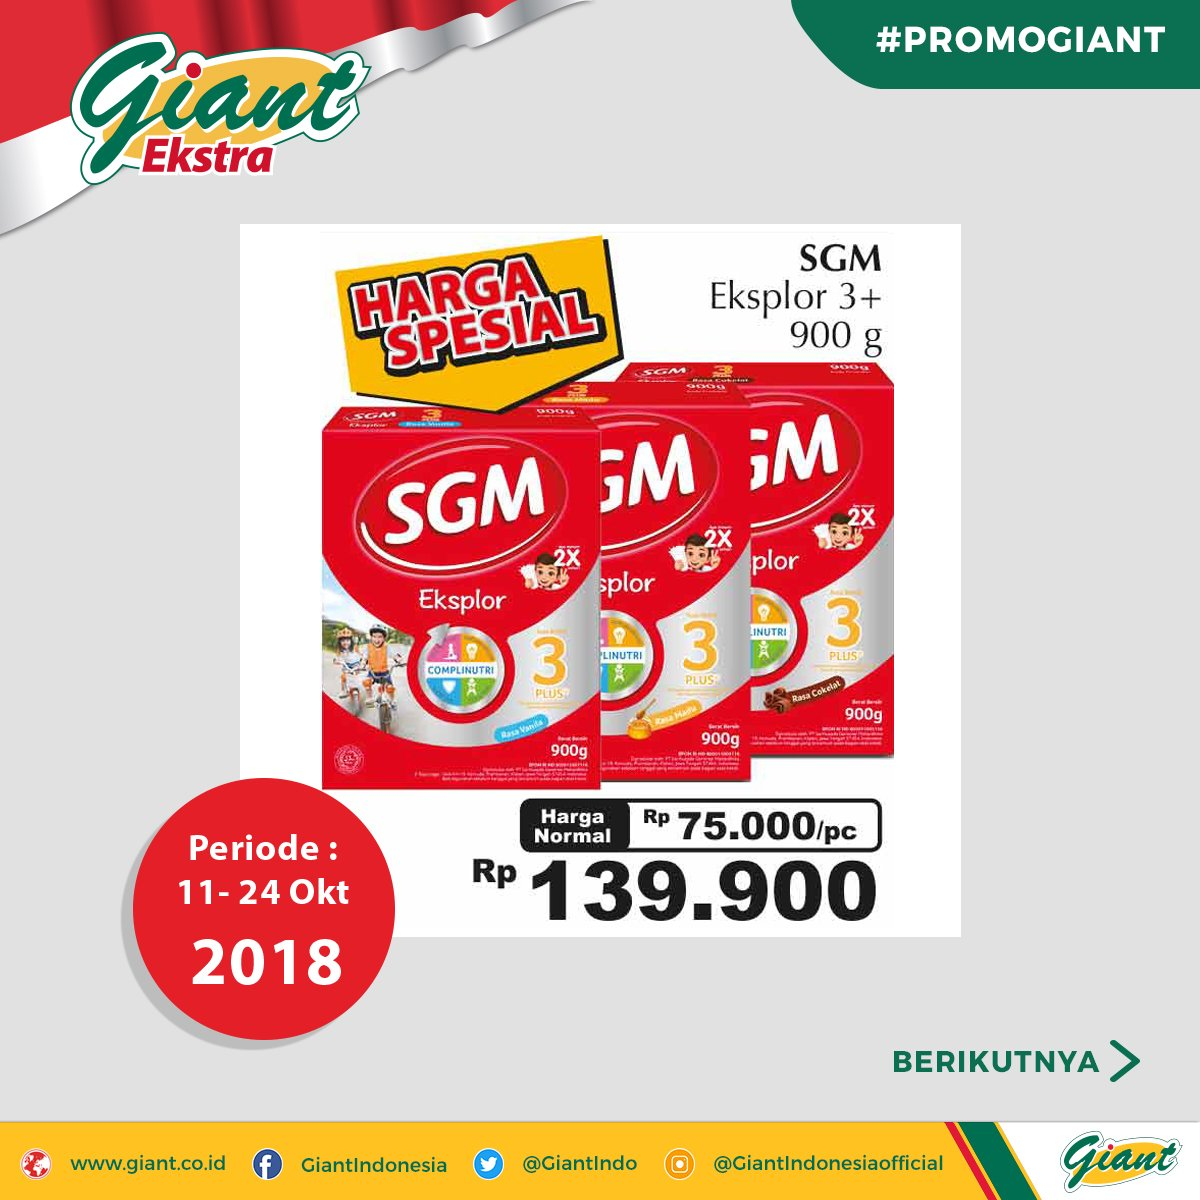 Giant - Promo Giant Ekstra Beli Banyak Untung Banyak (s.d 24 Okt 2018)